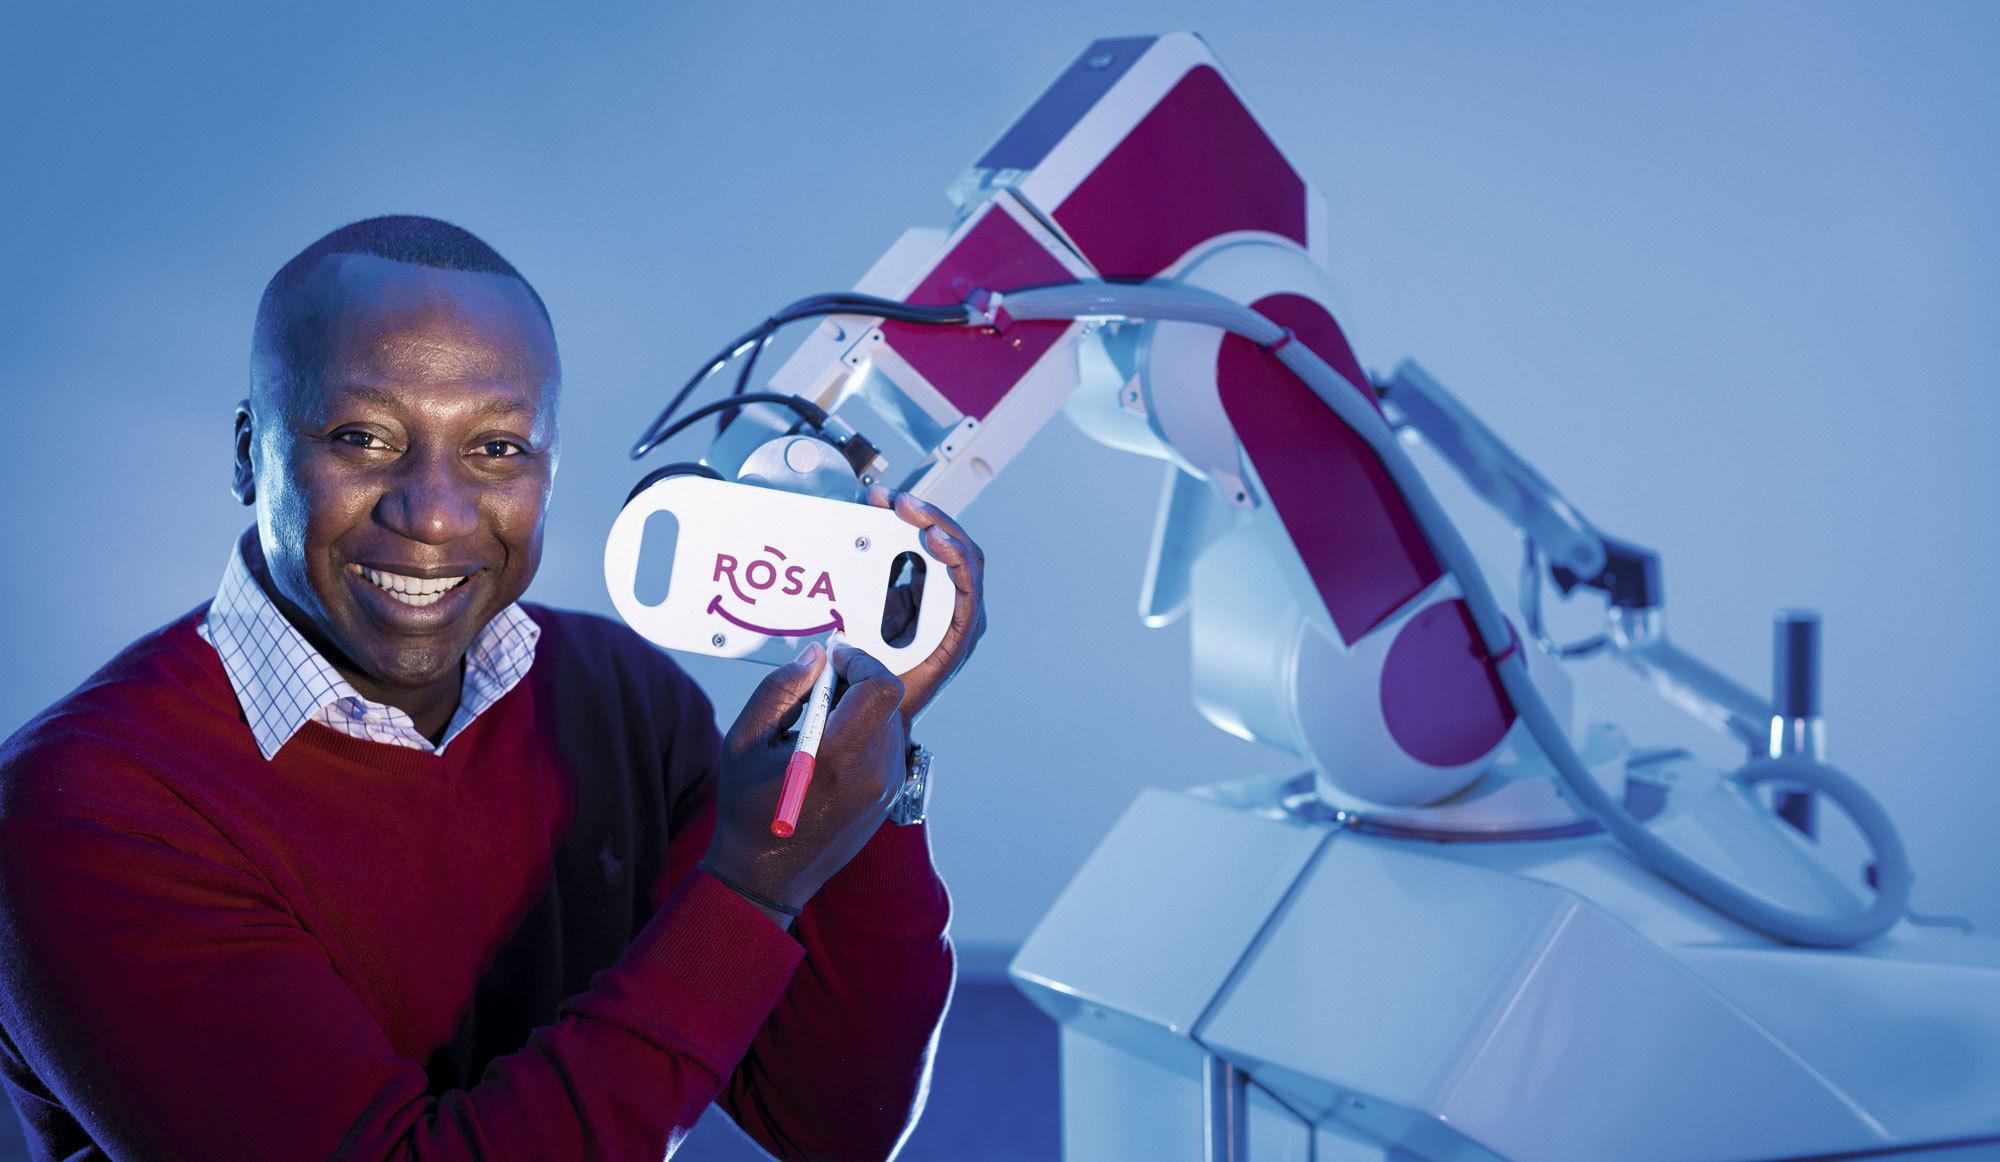 Sticker risitas bertin nahum qi intelligence noir africain afrique neurologie chirurgie robot rosa